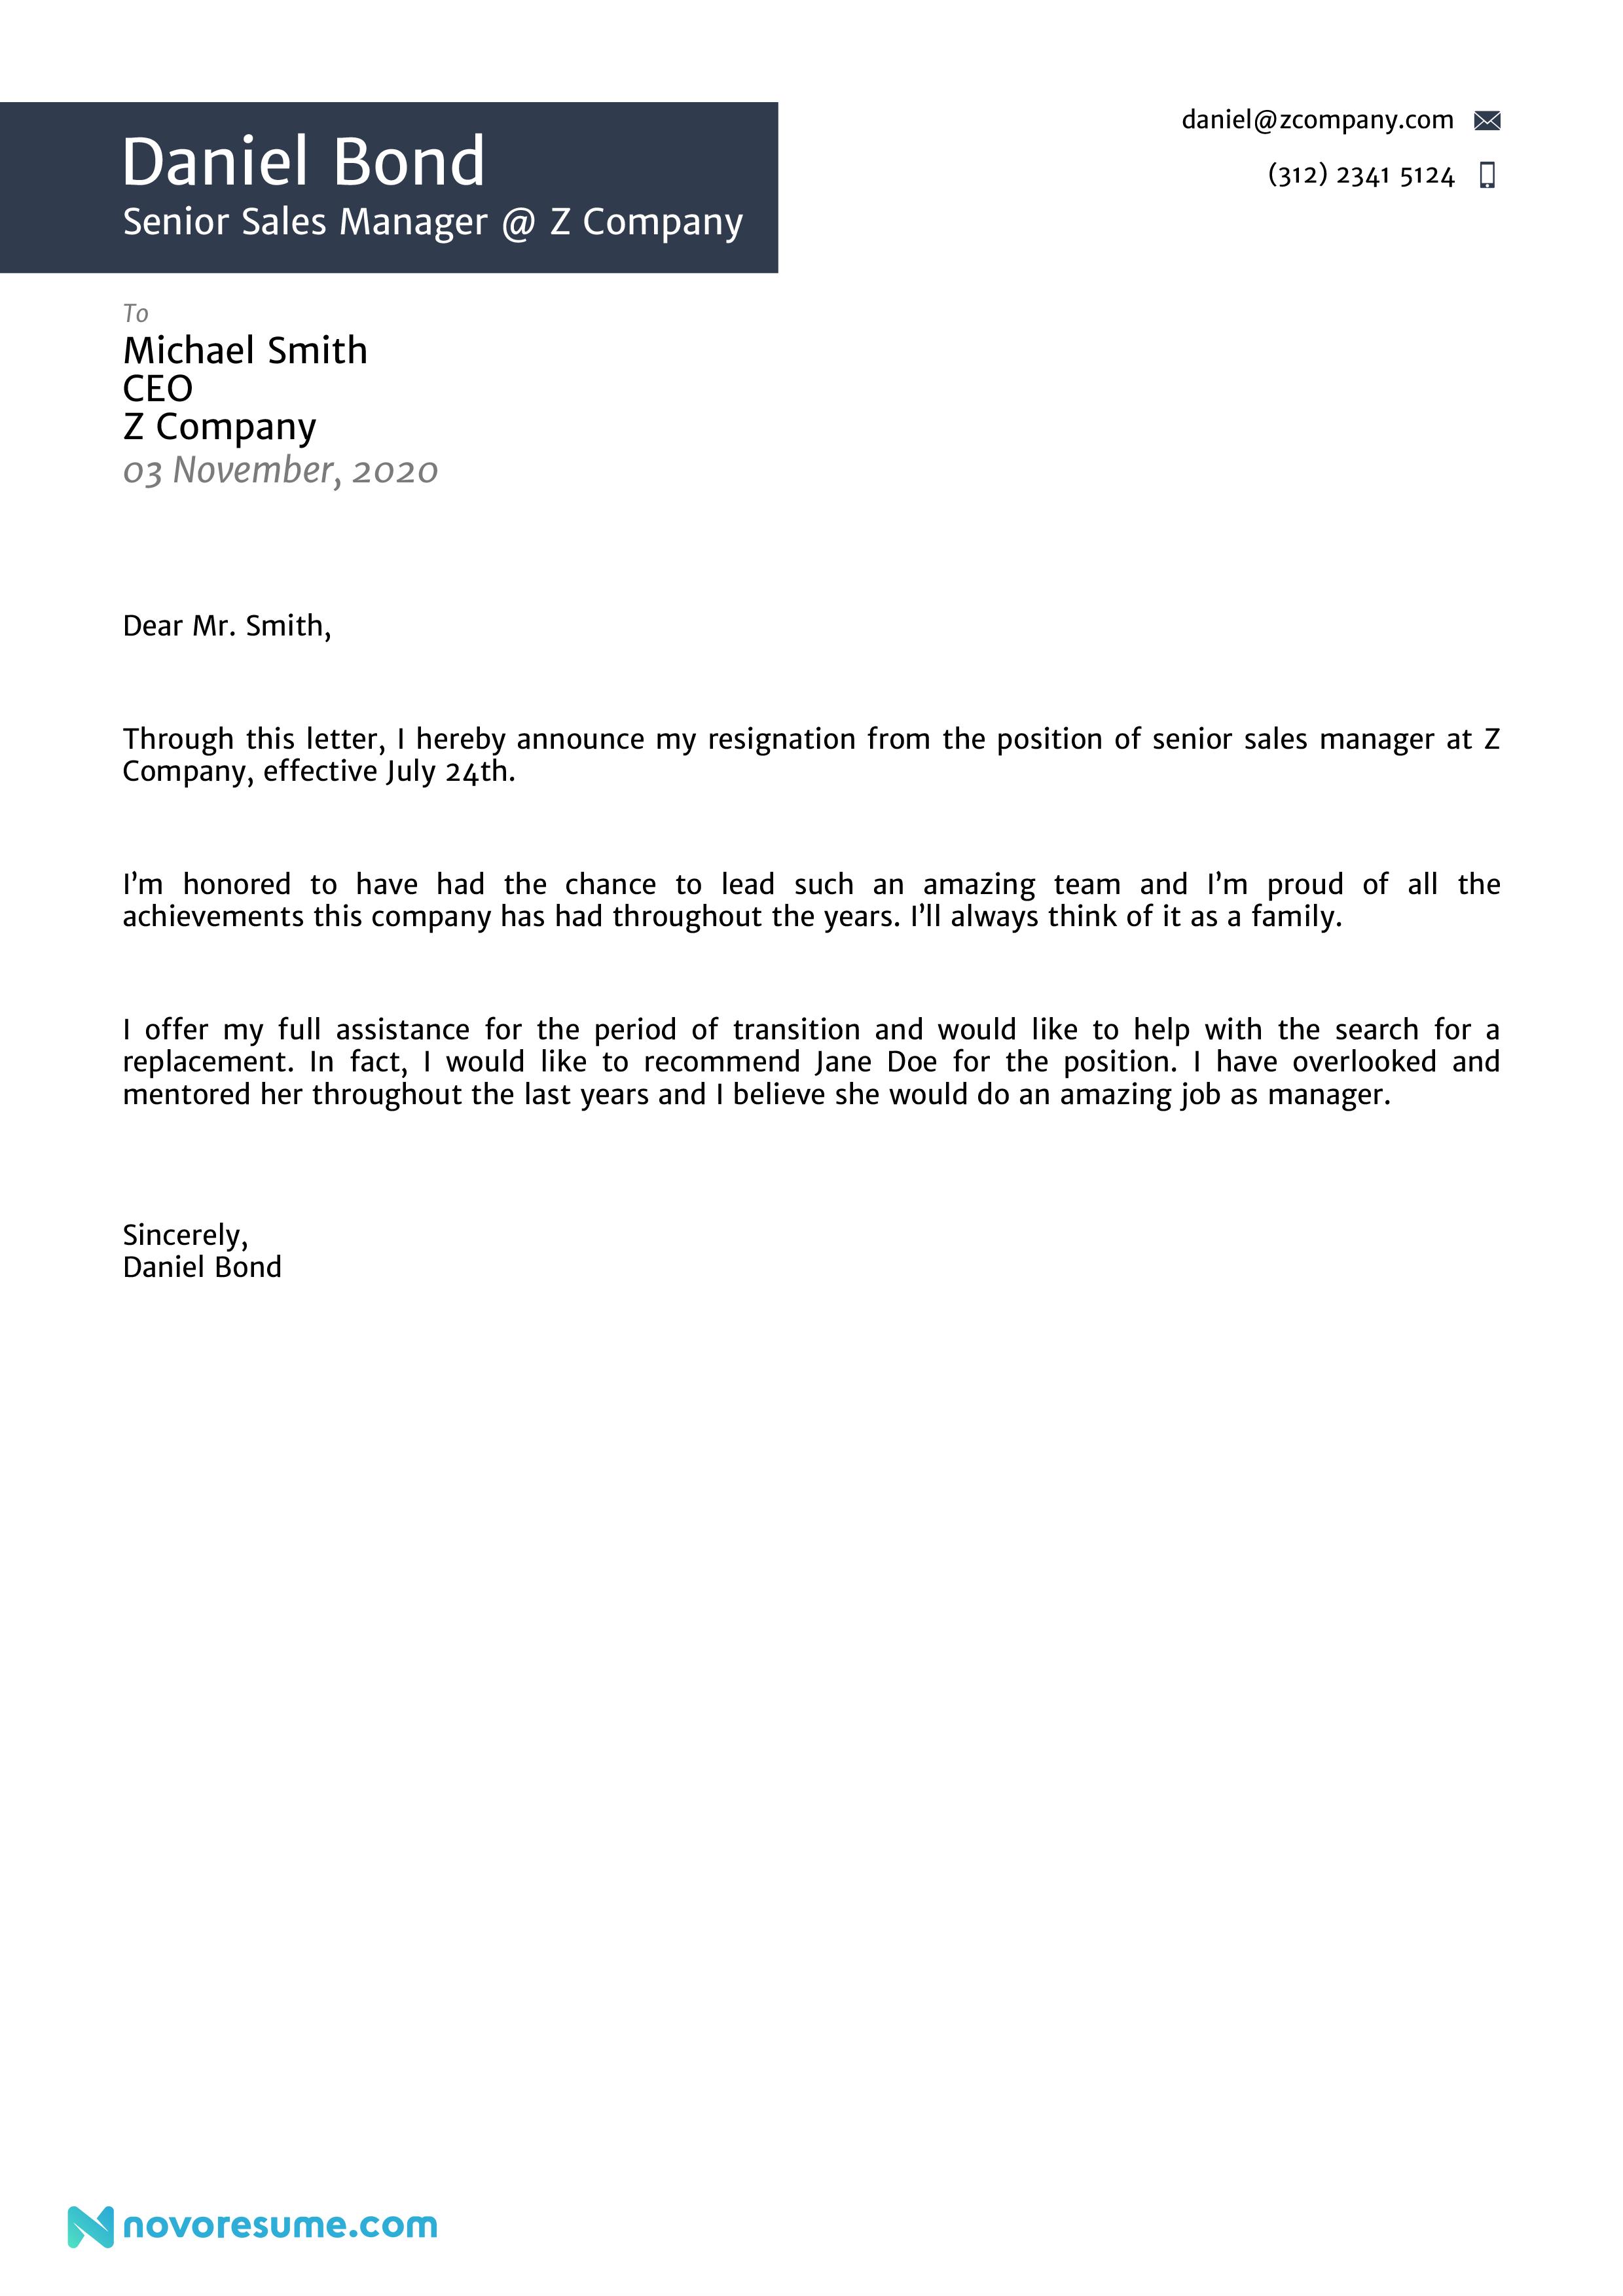 Resignation Letter Sample for a Manager